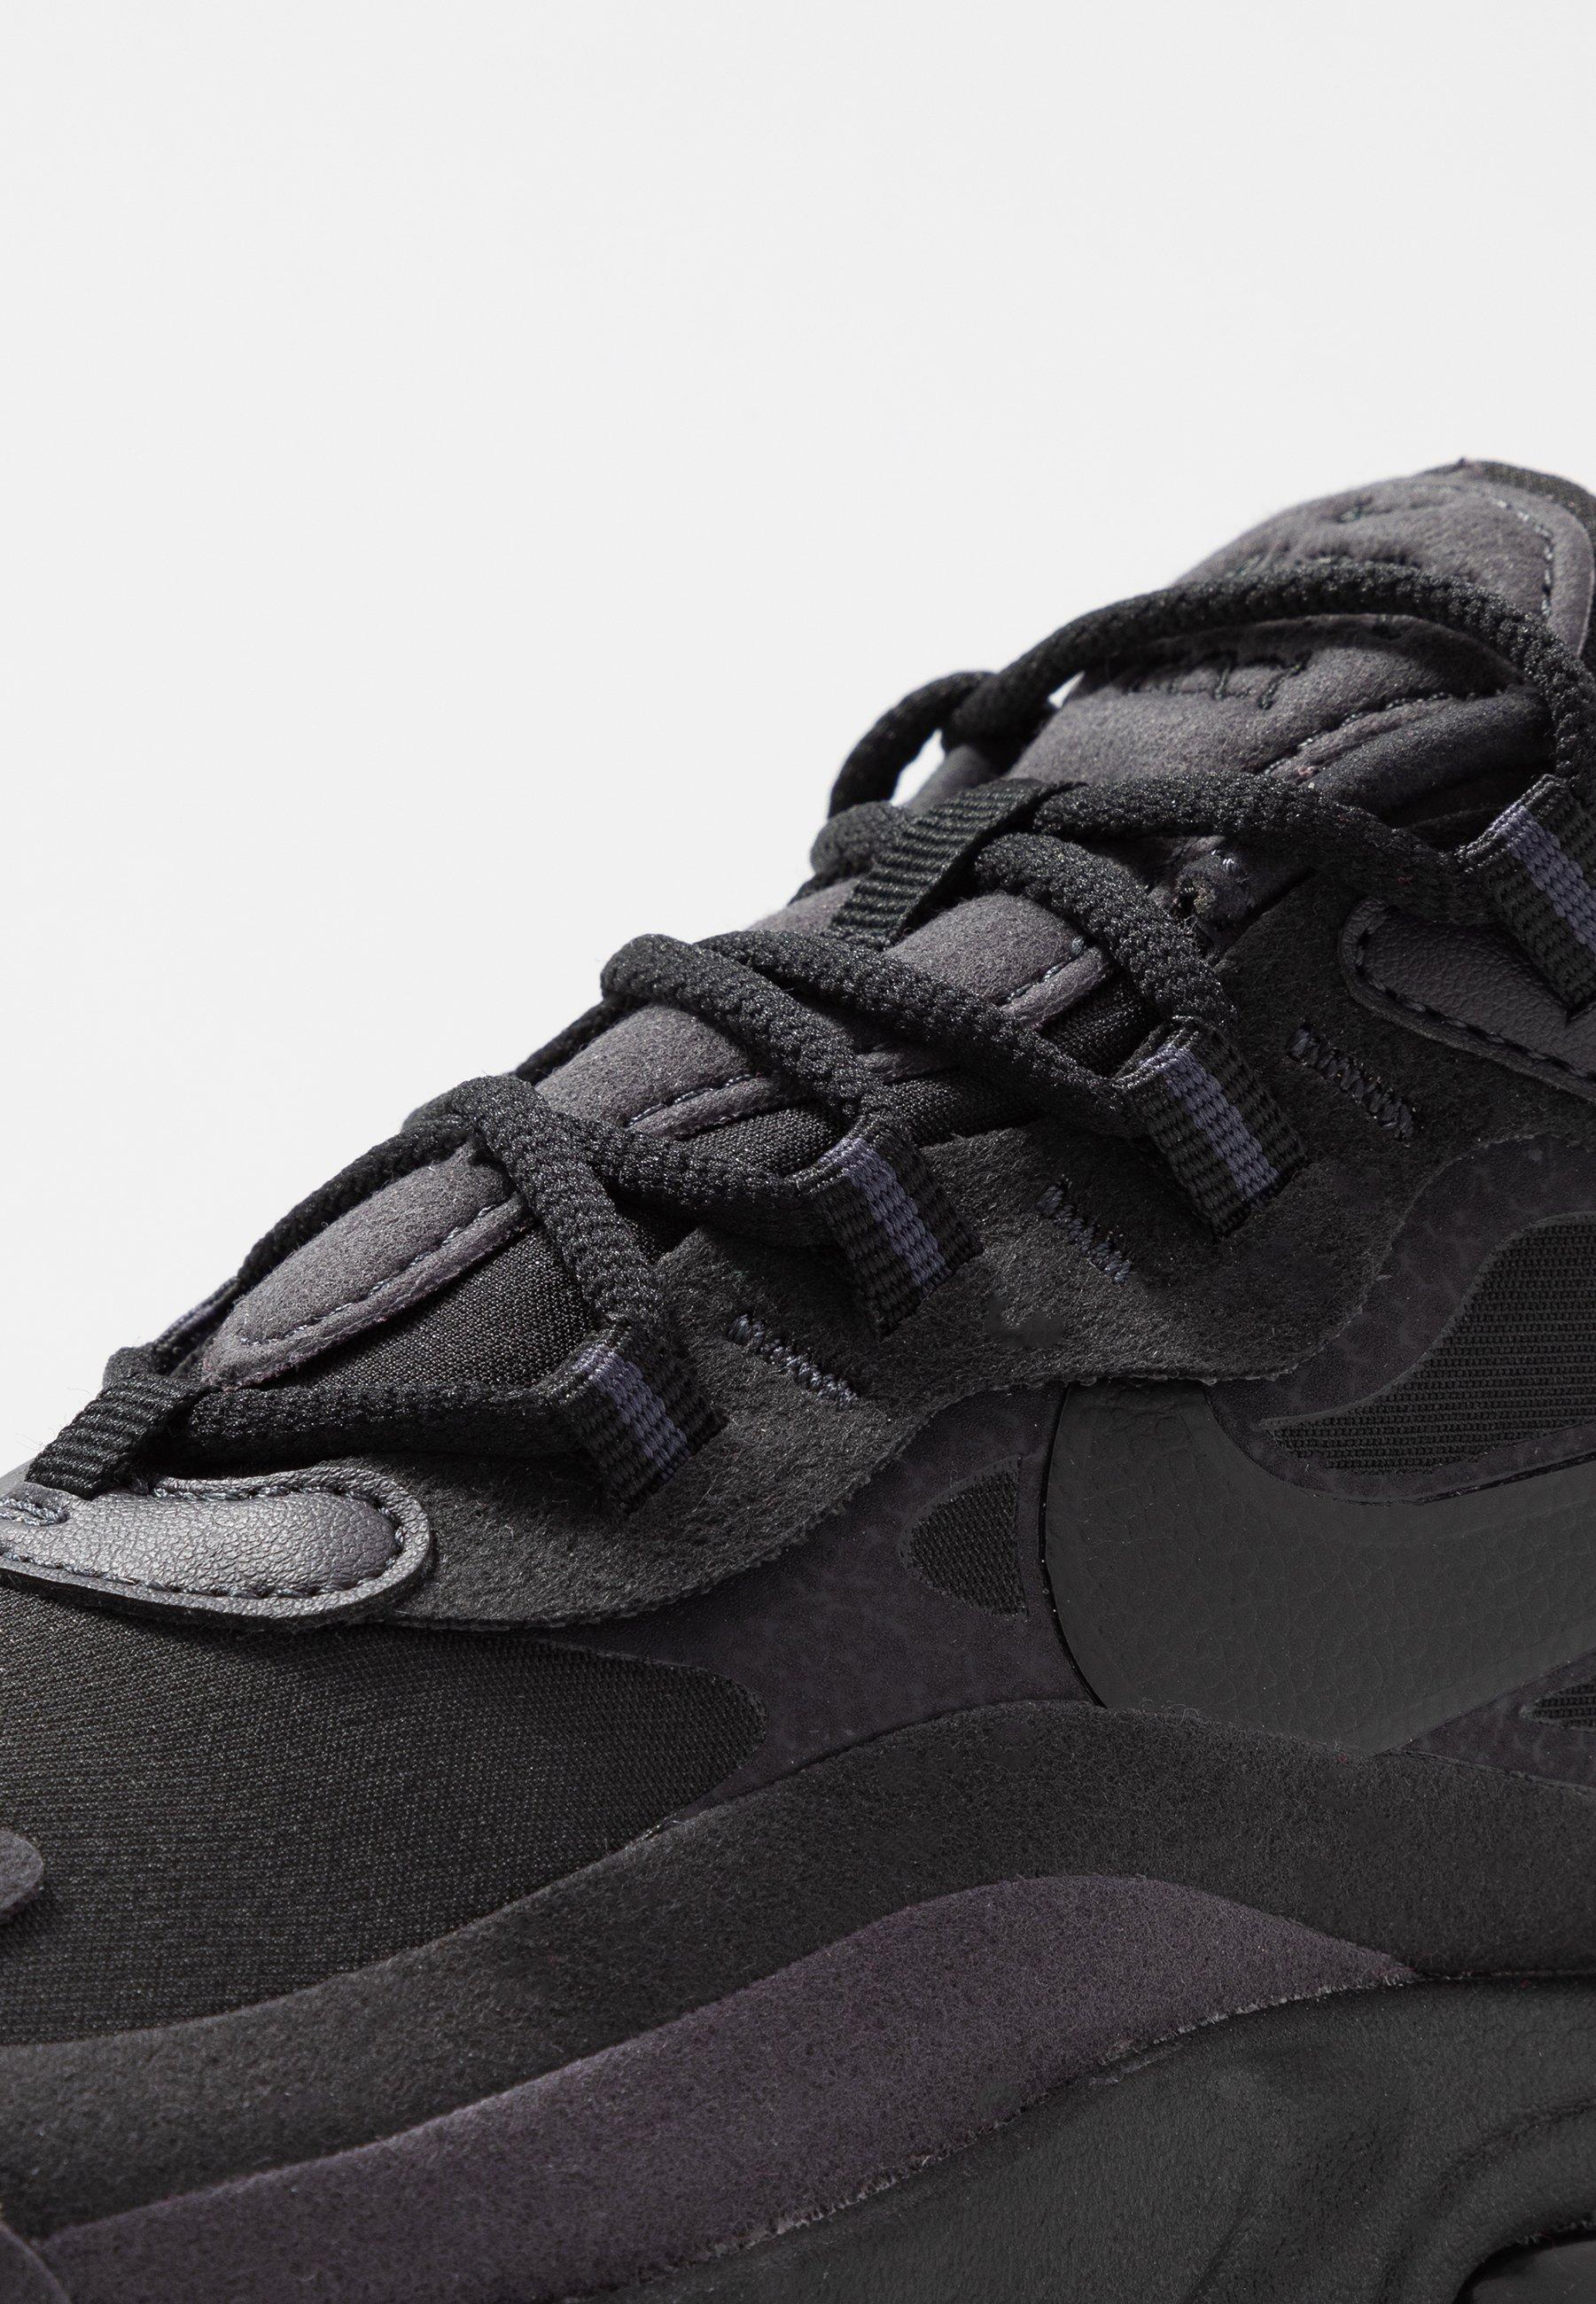 Nike Sportswear Air Max 270 React - Sneakers Basse Black/oil Grey/white cb15WXE